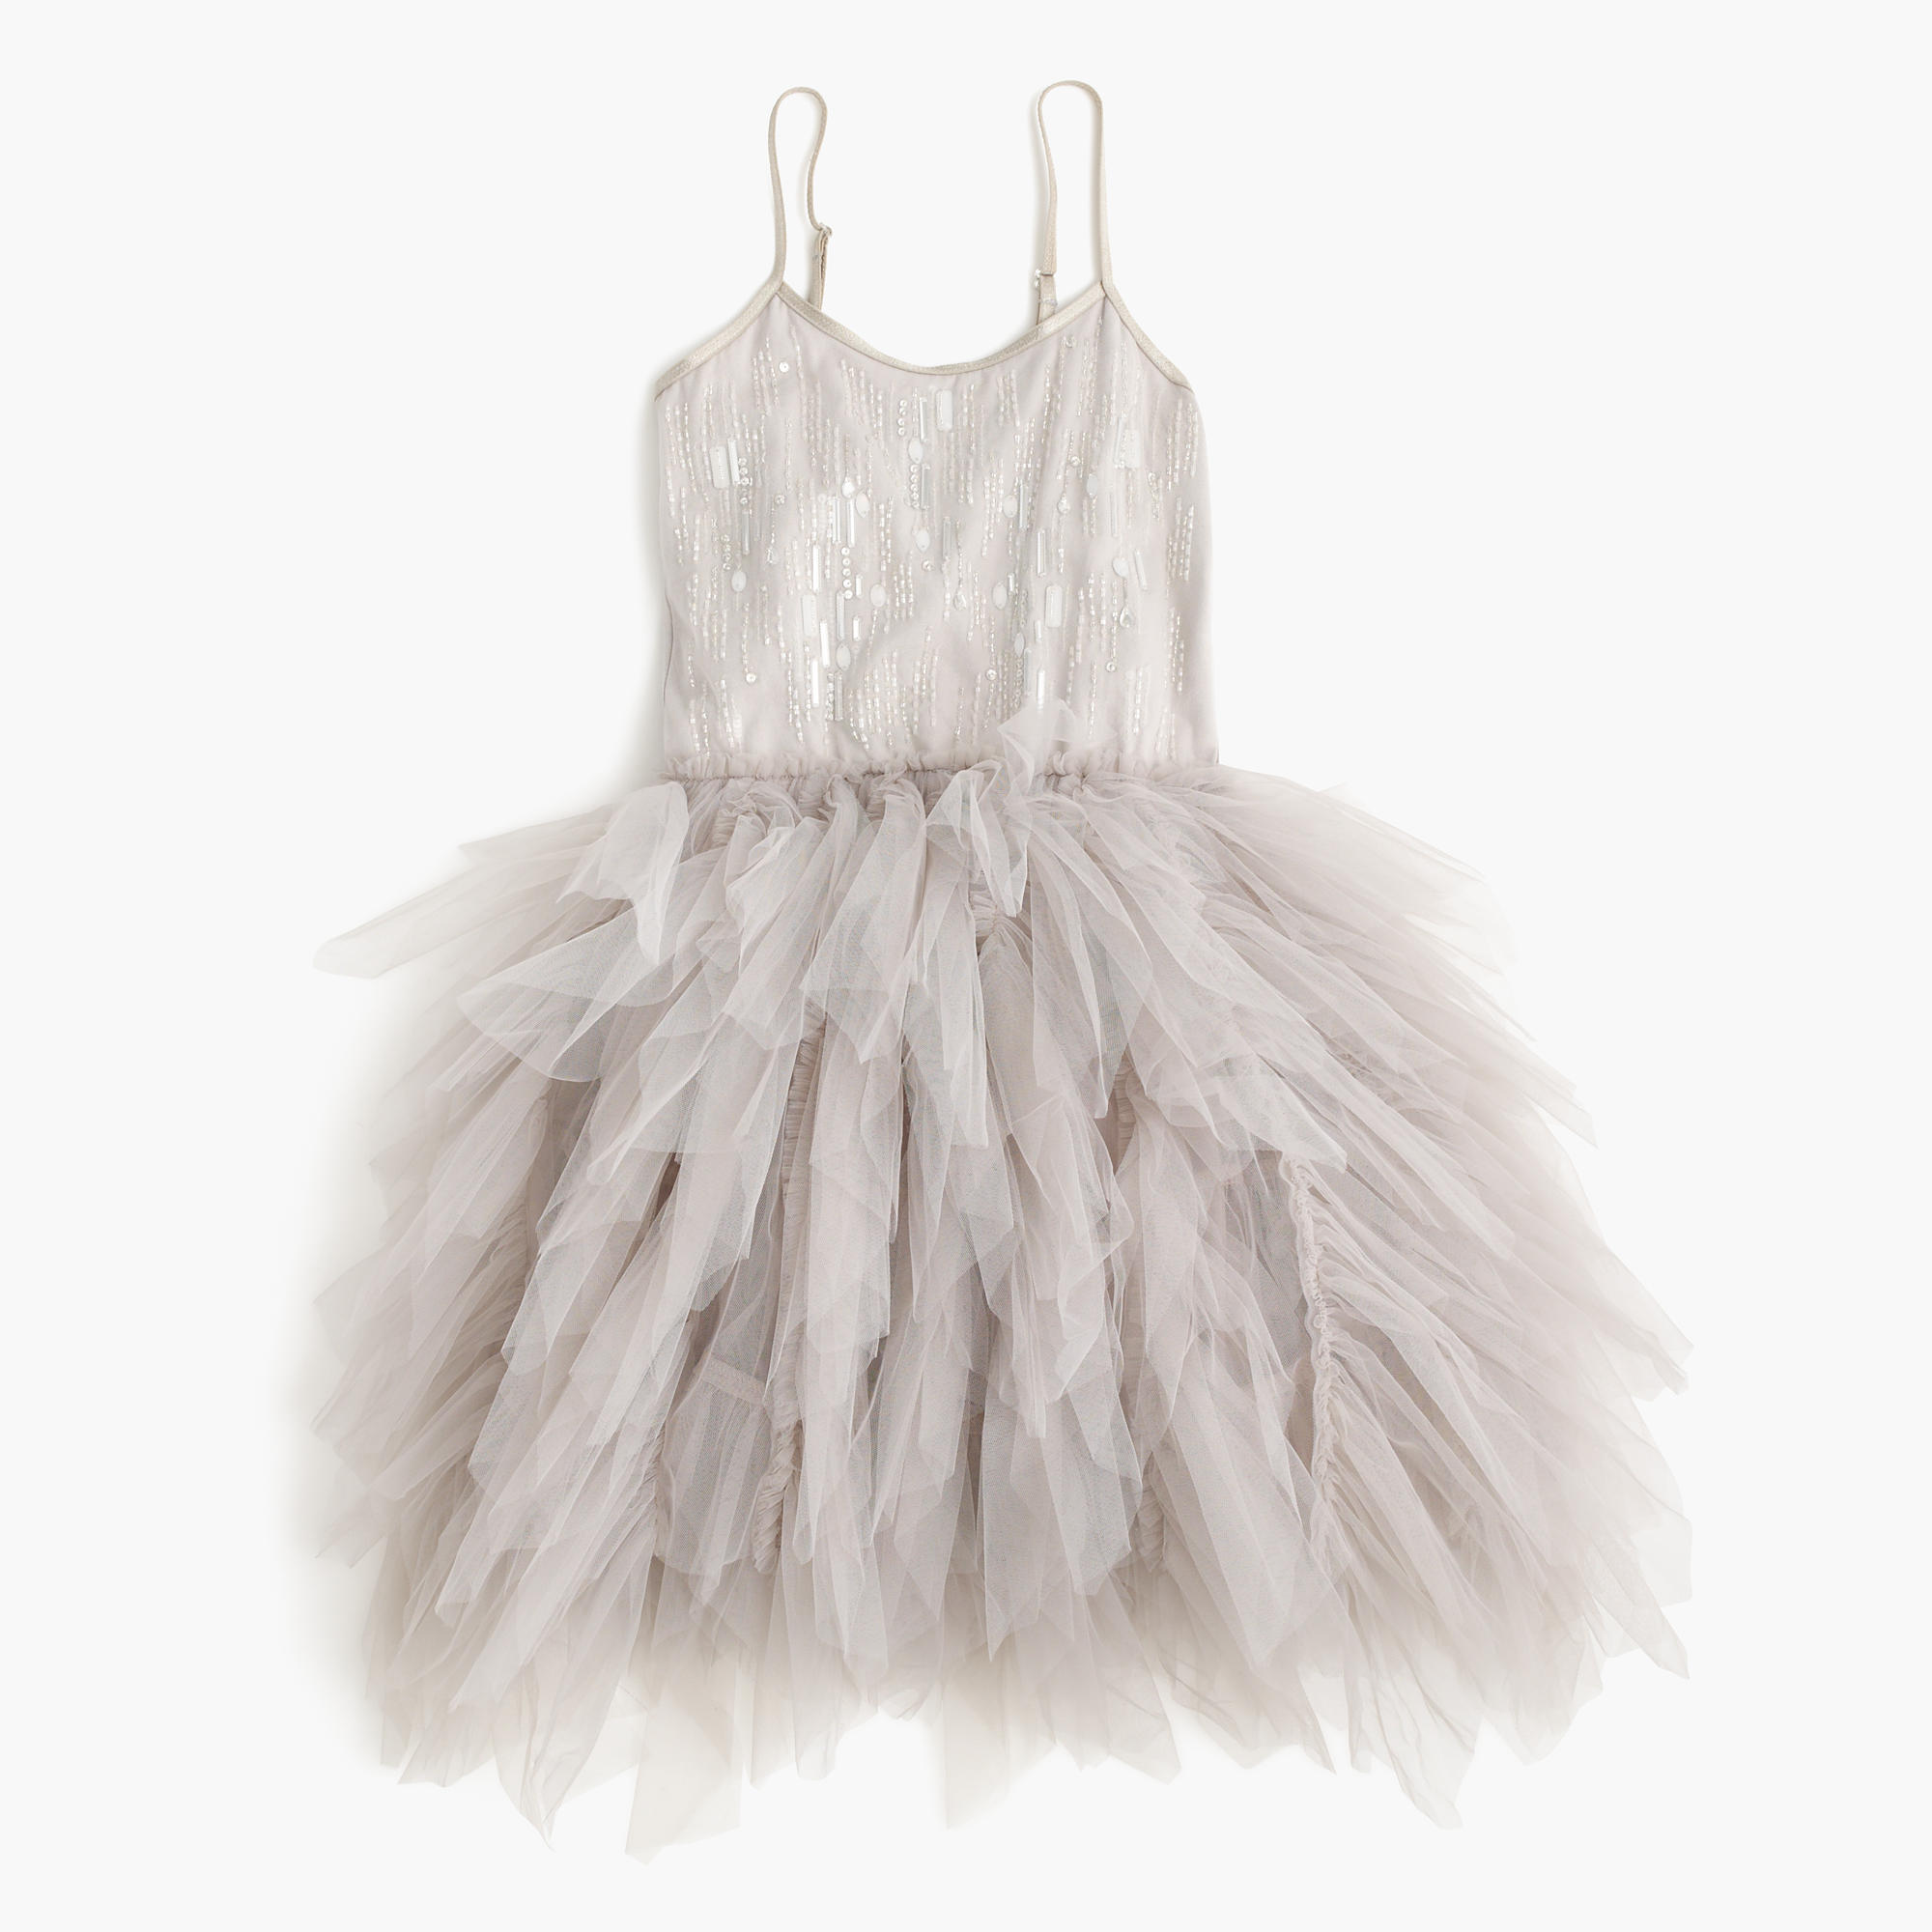 Girls 39 Tutu Du Monde Dreamery Tutu Dress Girls 39 Dresses J Crew